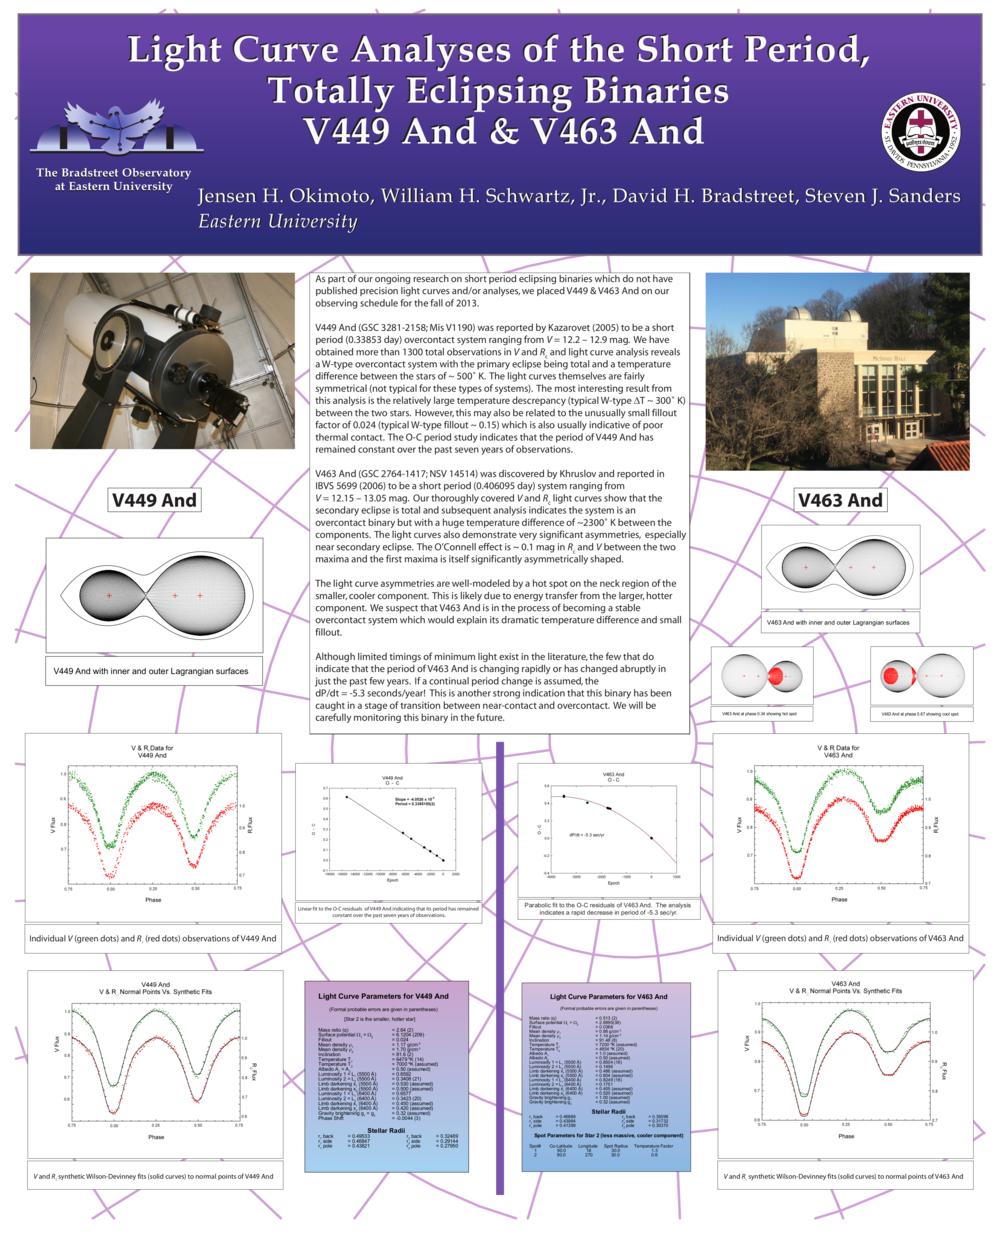 "<a href=""https://eastern-astronomy.squarespace.com/s/V449V463-poster-for-conference1.pdf"">V449 And & V463 And</a>"